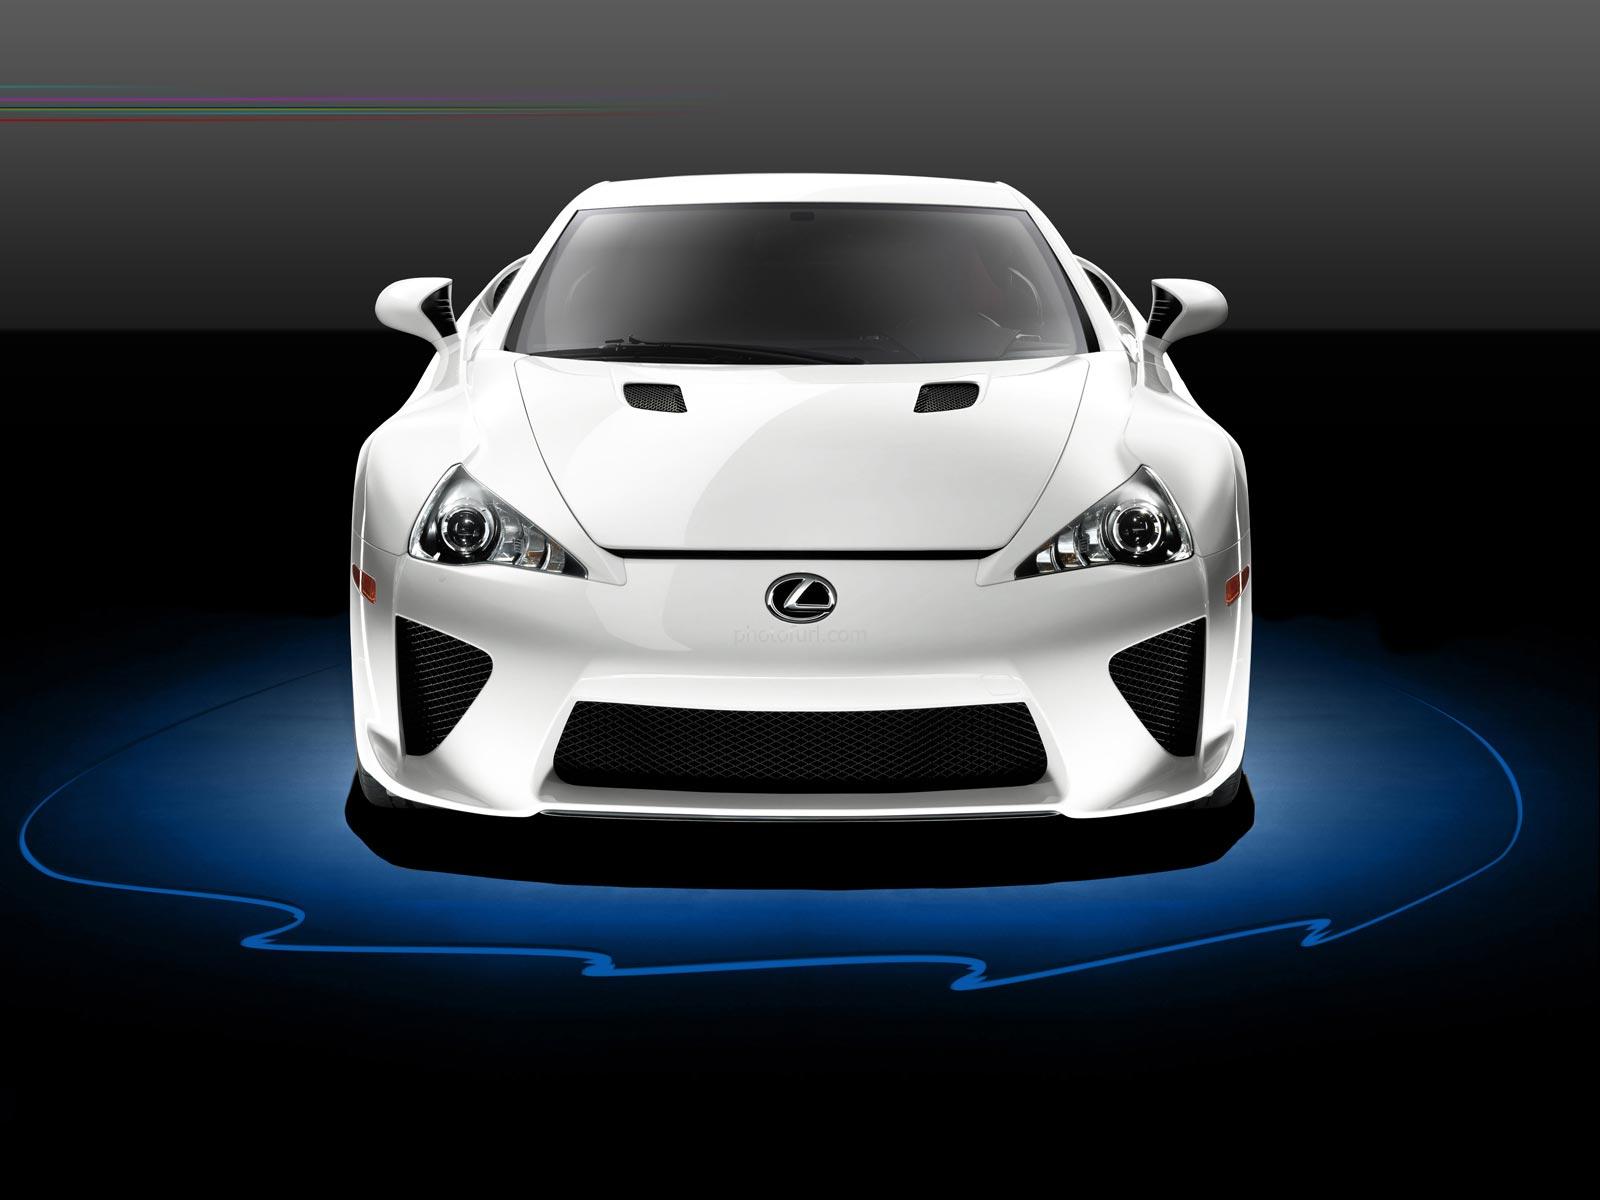 White Lexus Lfa Wallpaper 1600x1200 Download Hd Wallpaper Wallpapertip